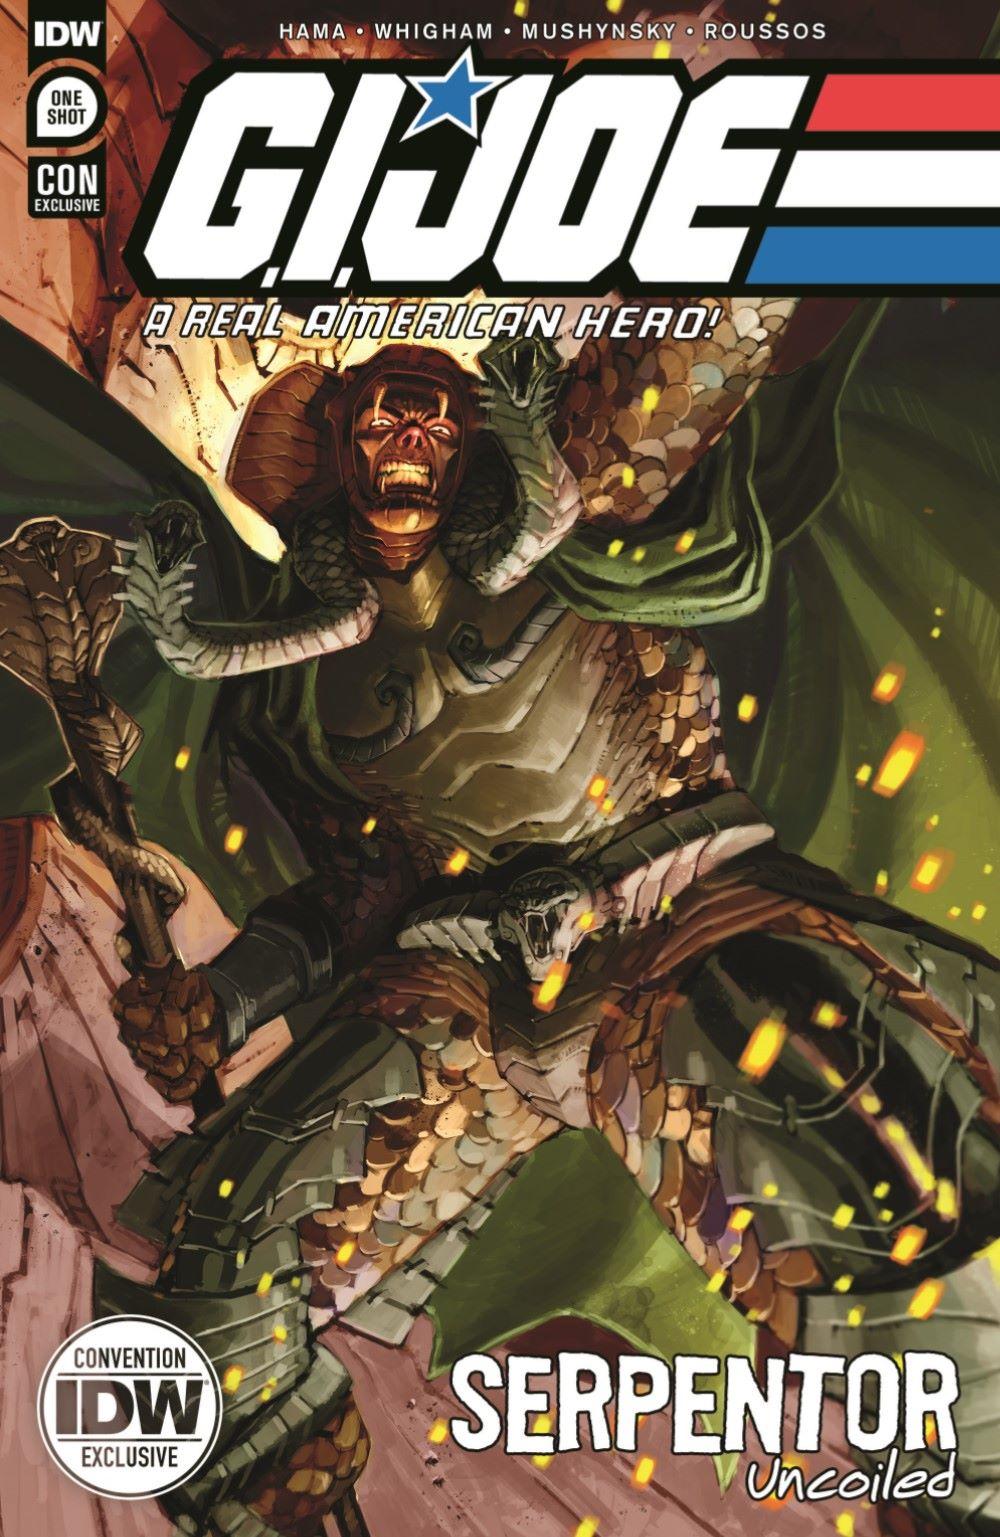 GIJoeRAH_SerpentorUncoiled-pr-02 ComicList Previews: G.I. JOE A REAL AMERICAN HERO SERPENTOR UNCOILED #1